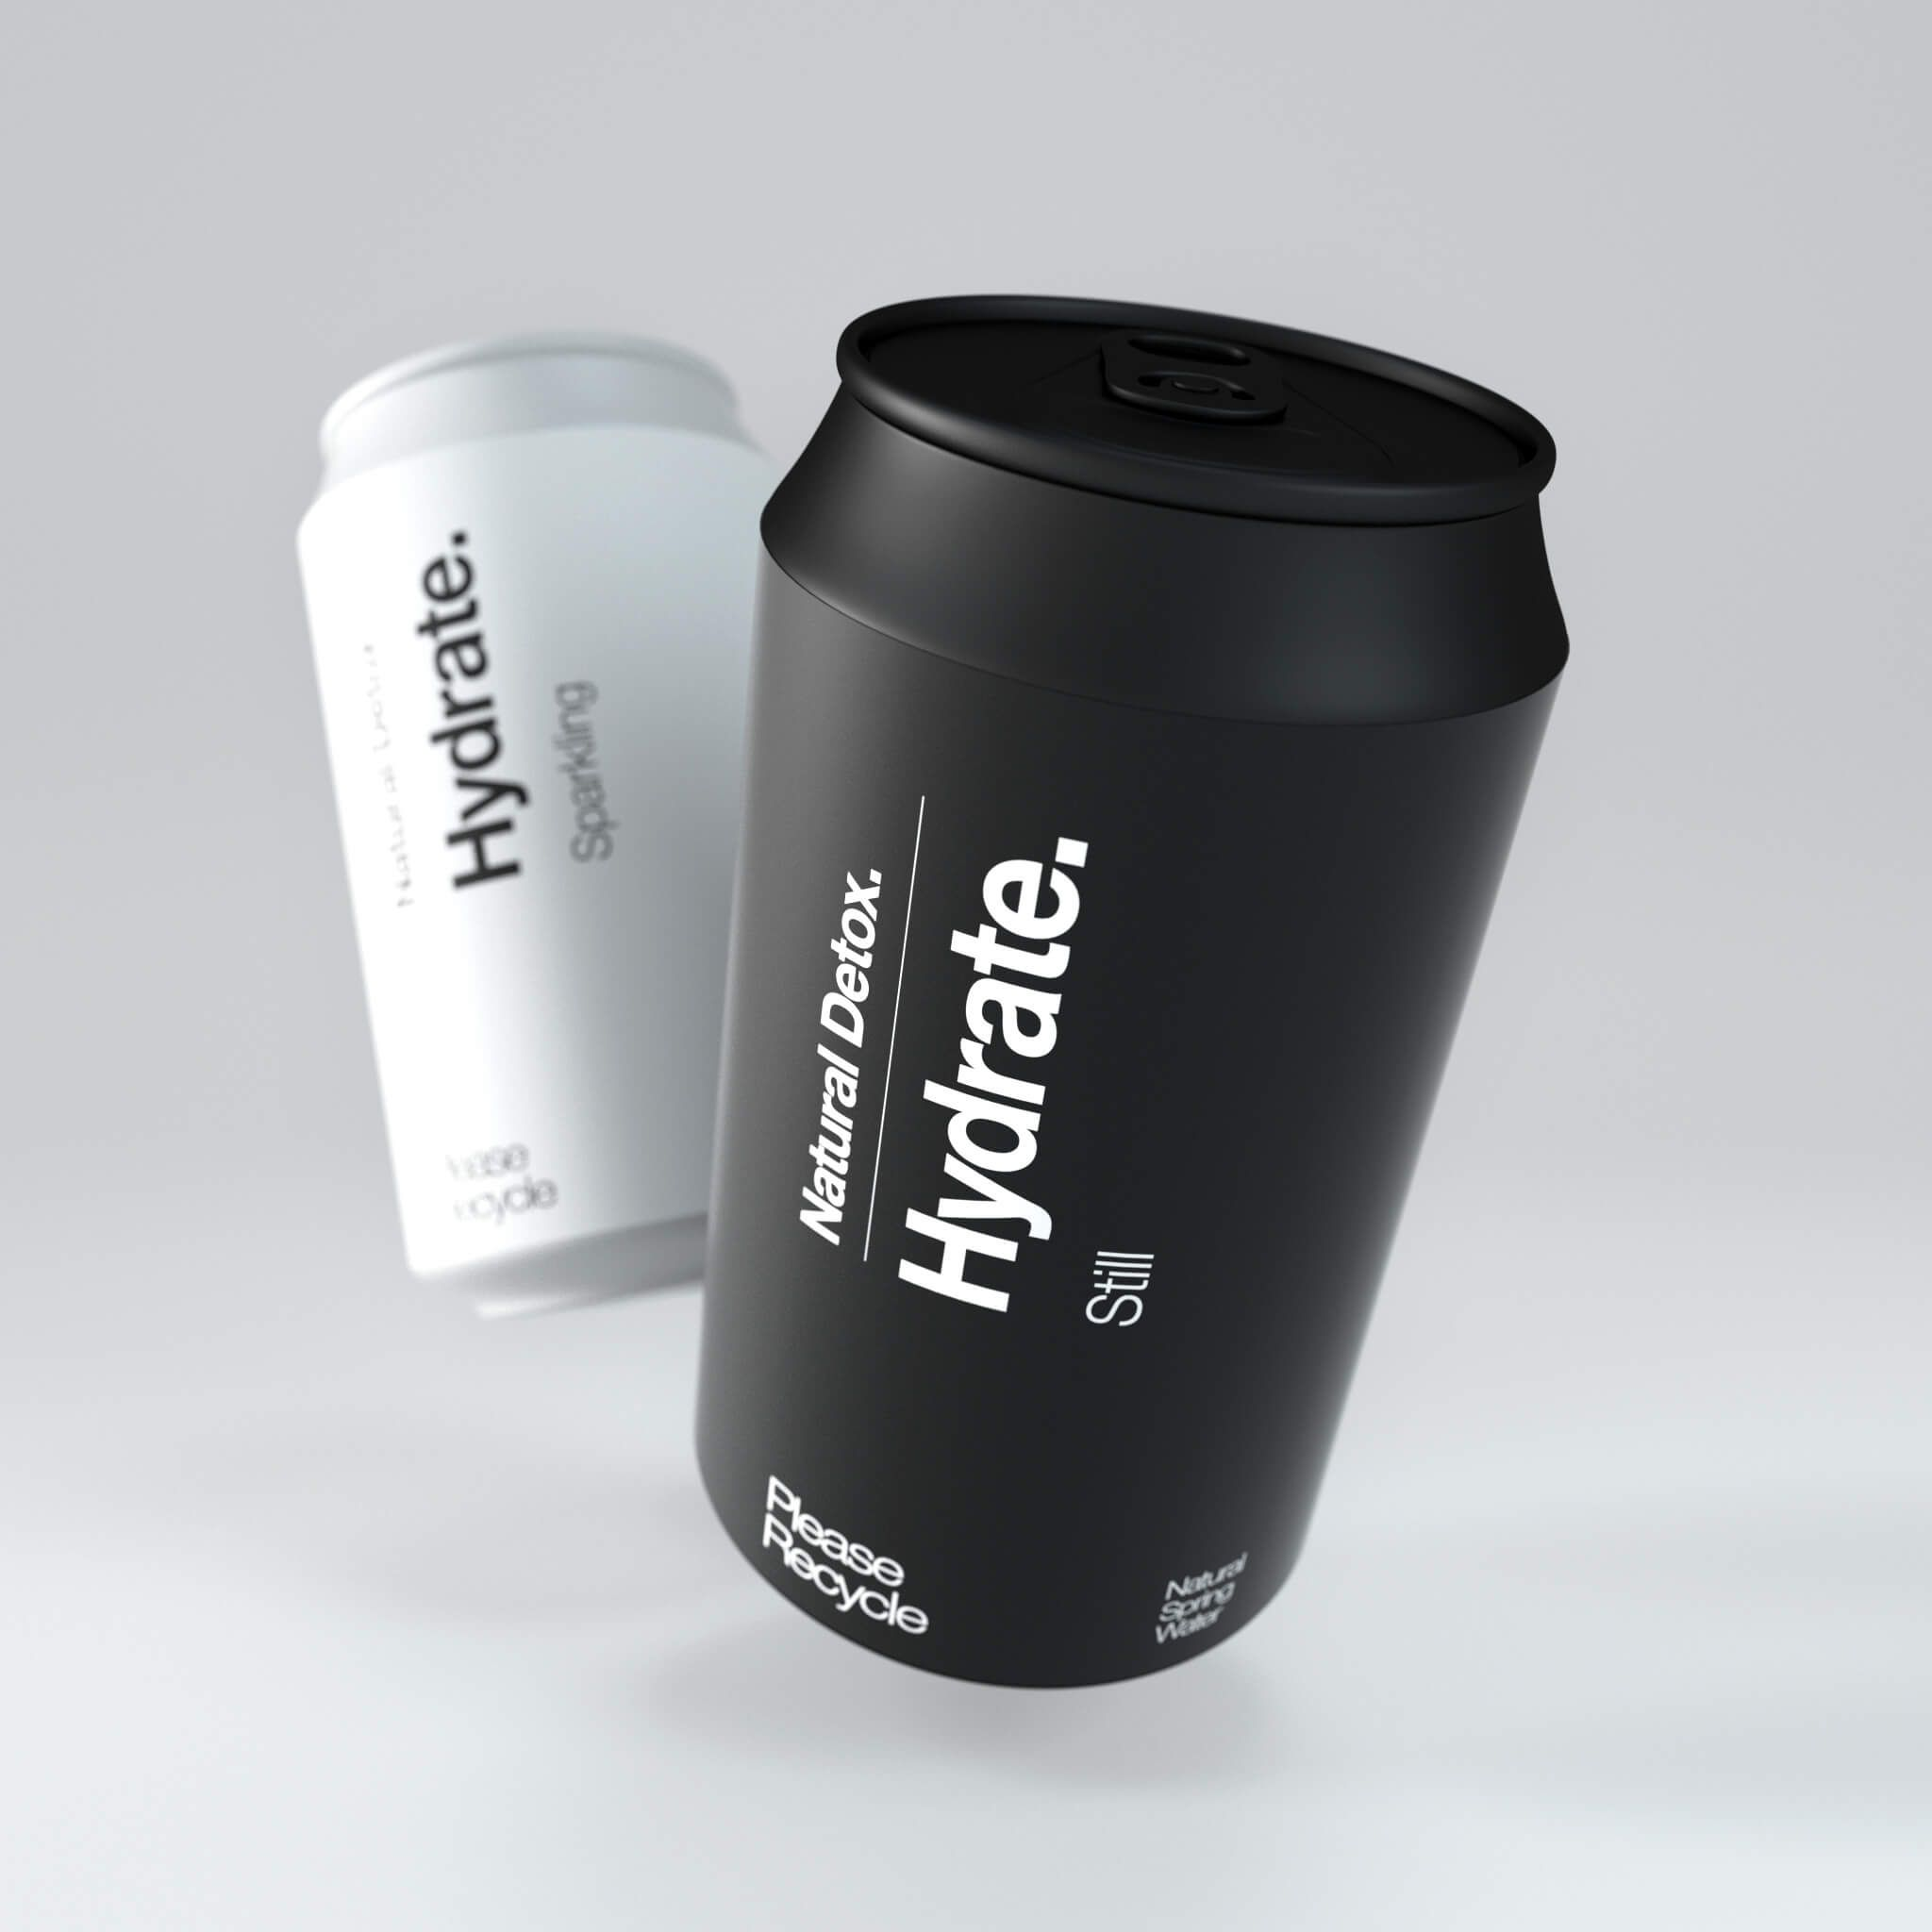 Download 900 Design Packaging Ideas In 2021 Packaging Packaging Design Design